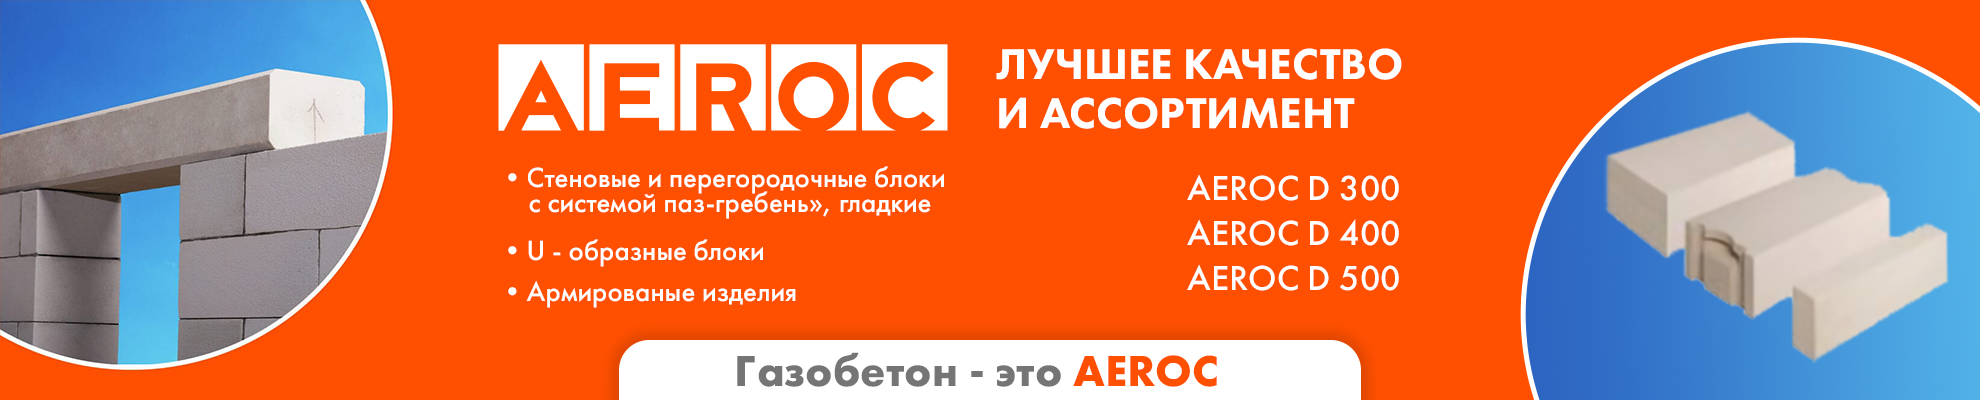 banner_aeroc_1980x400